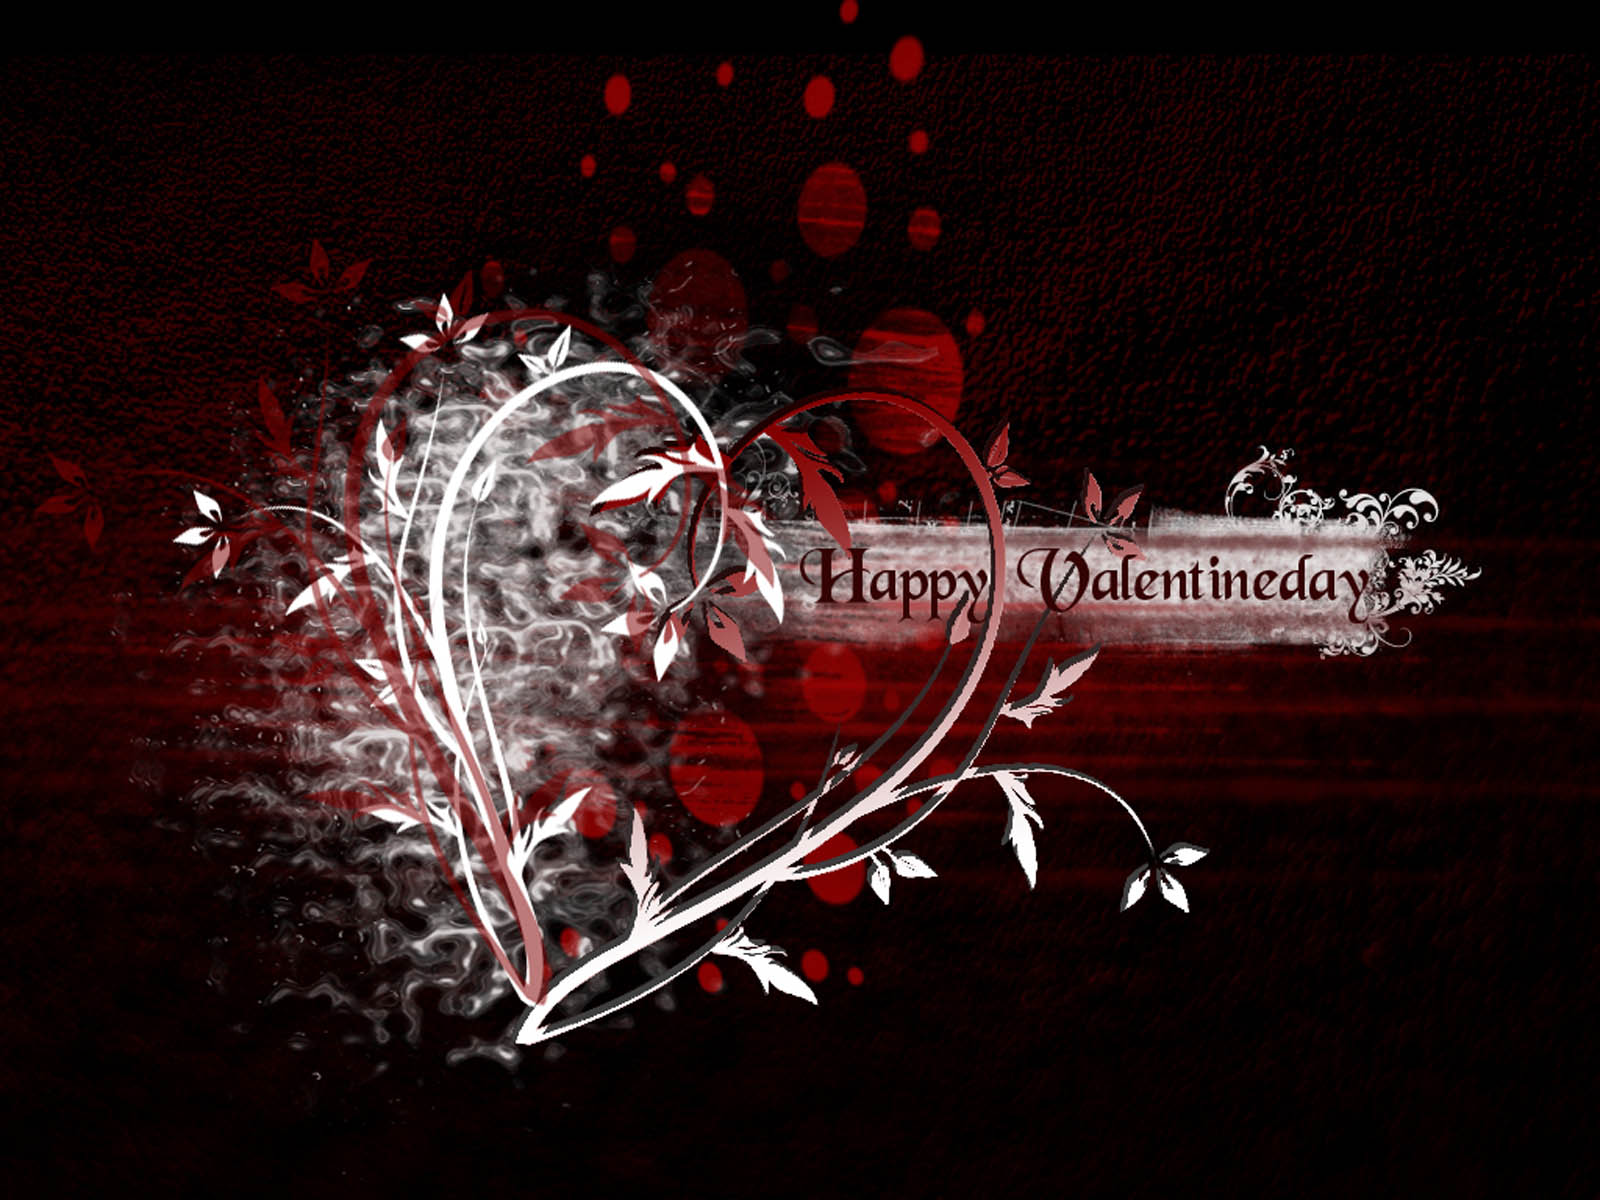 day desktop wallpapers valentines - photo #35